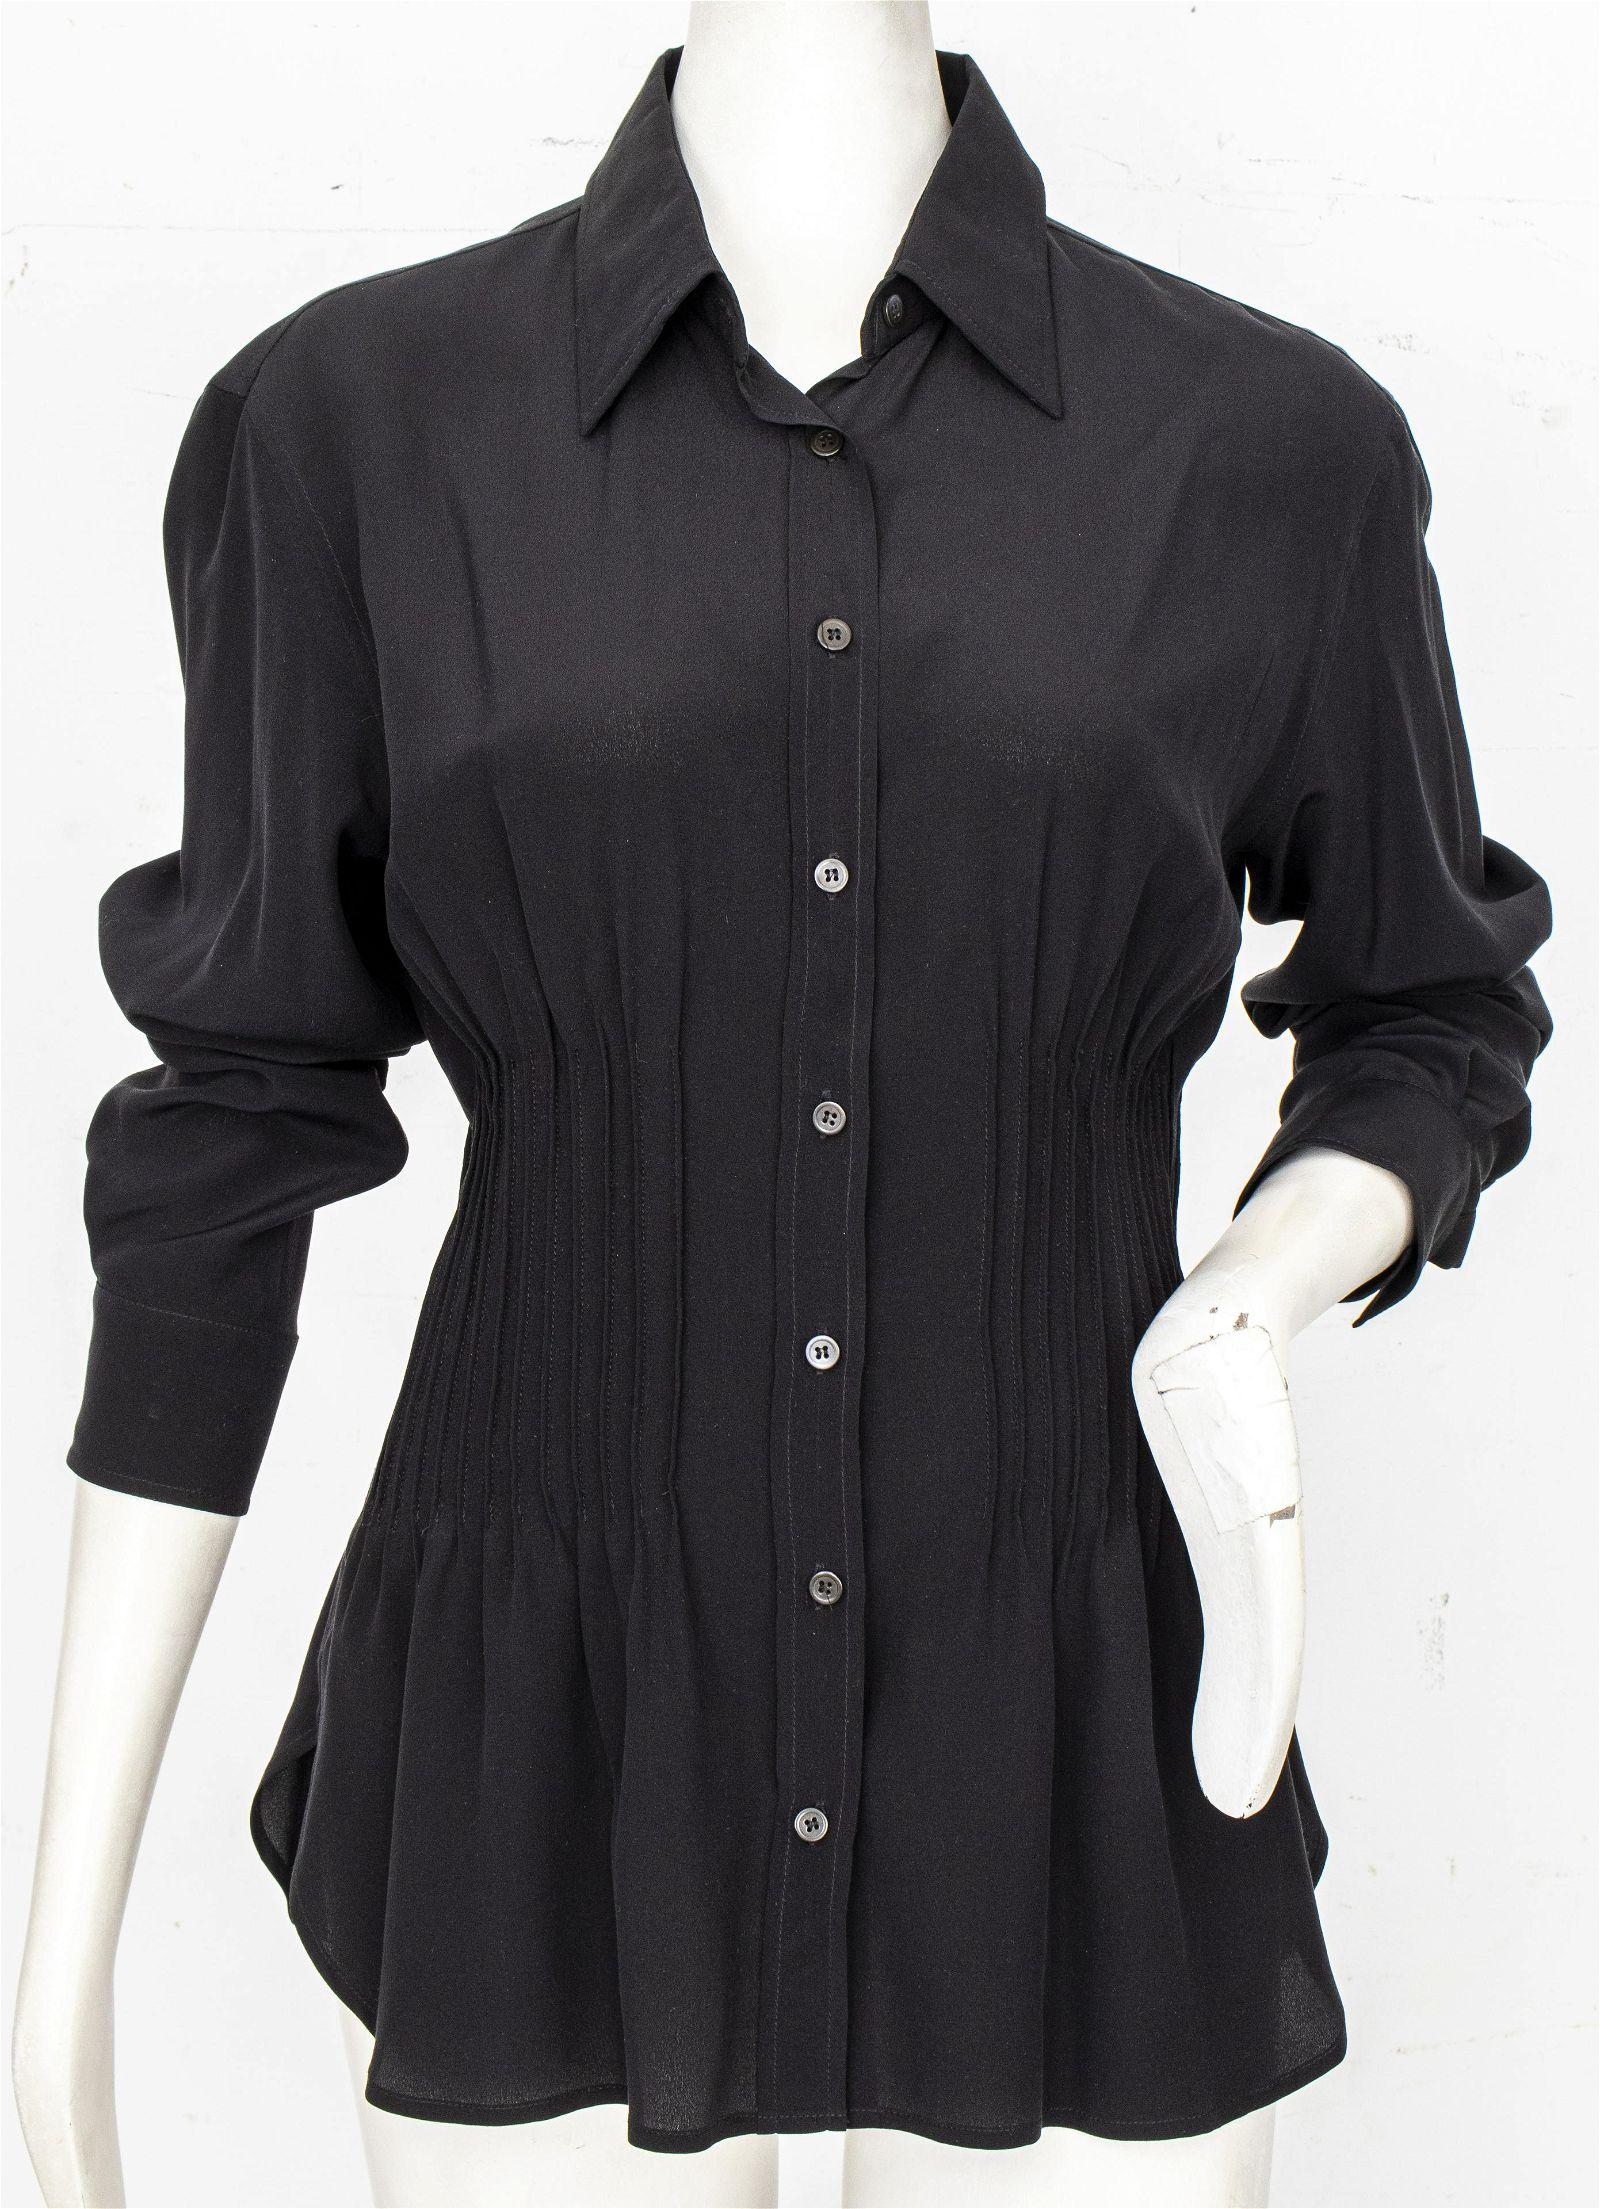 Yves Saint Laurent Black Silk Blouse, Size 42